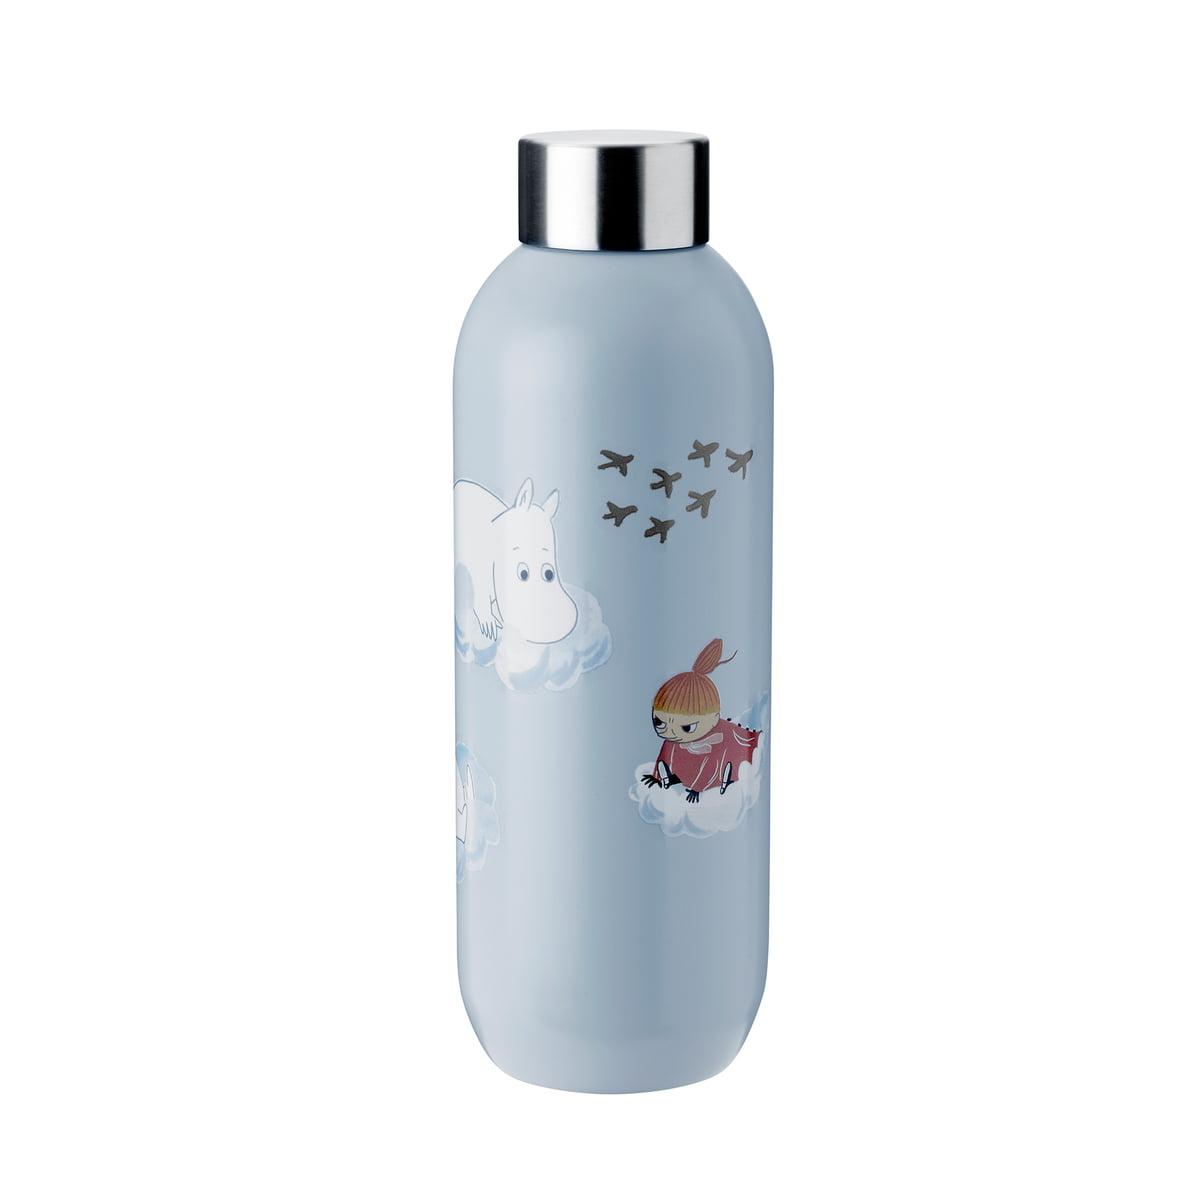 Stelton - Keep Cool Moomin Trinkflasche 0,75 l, cloud